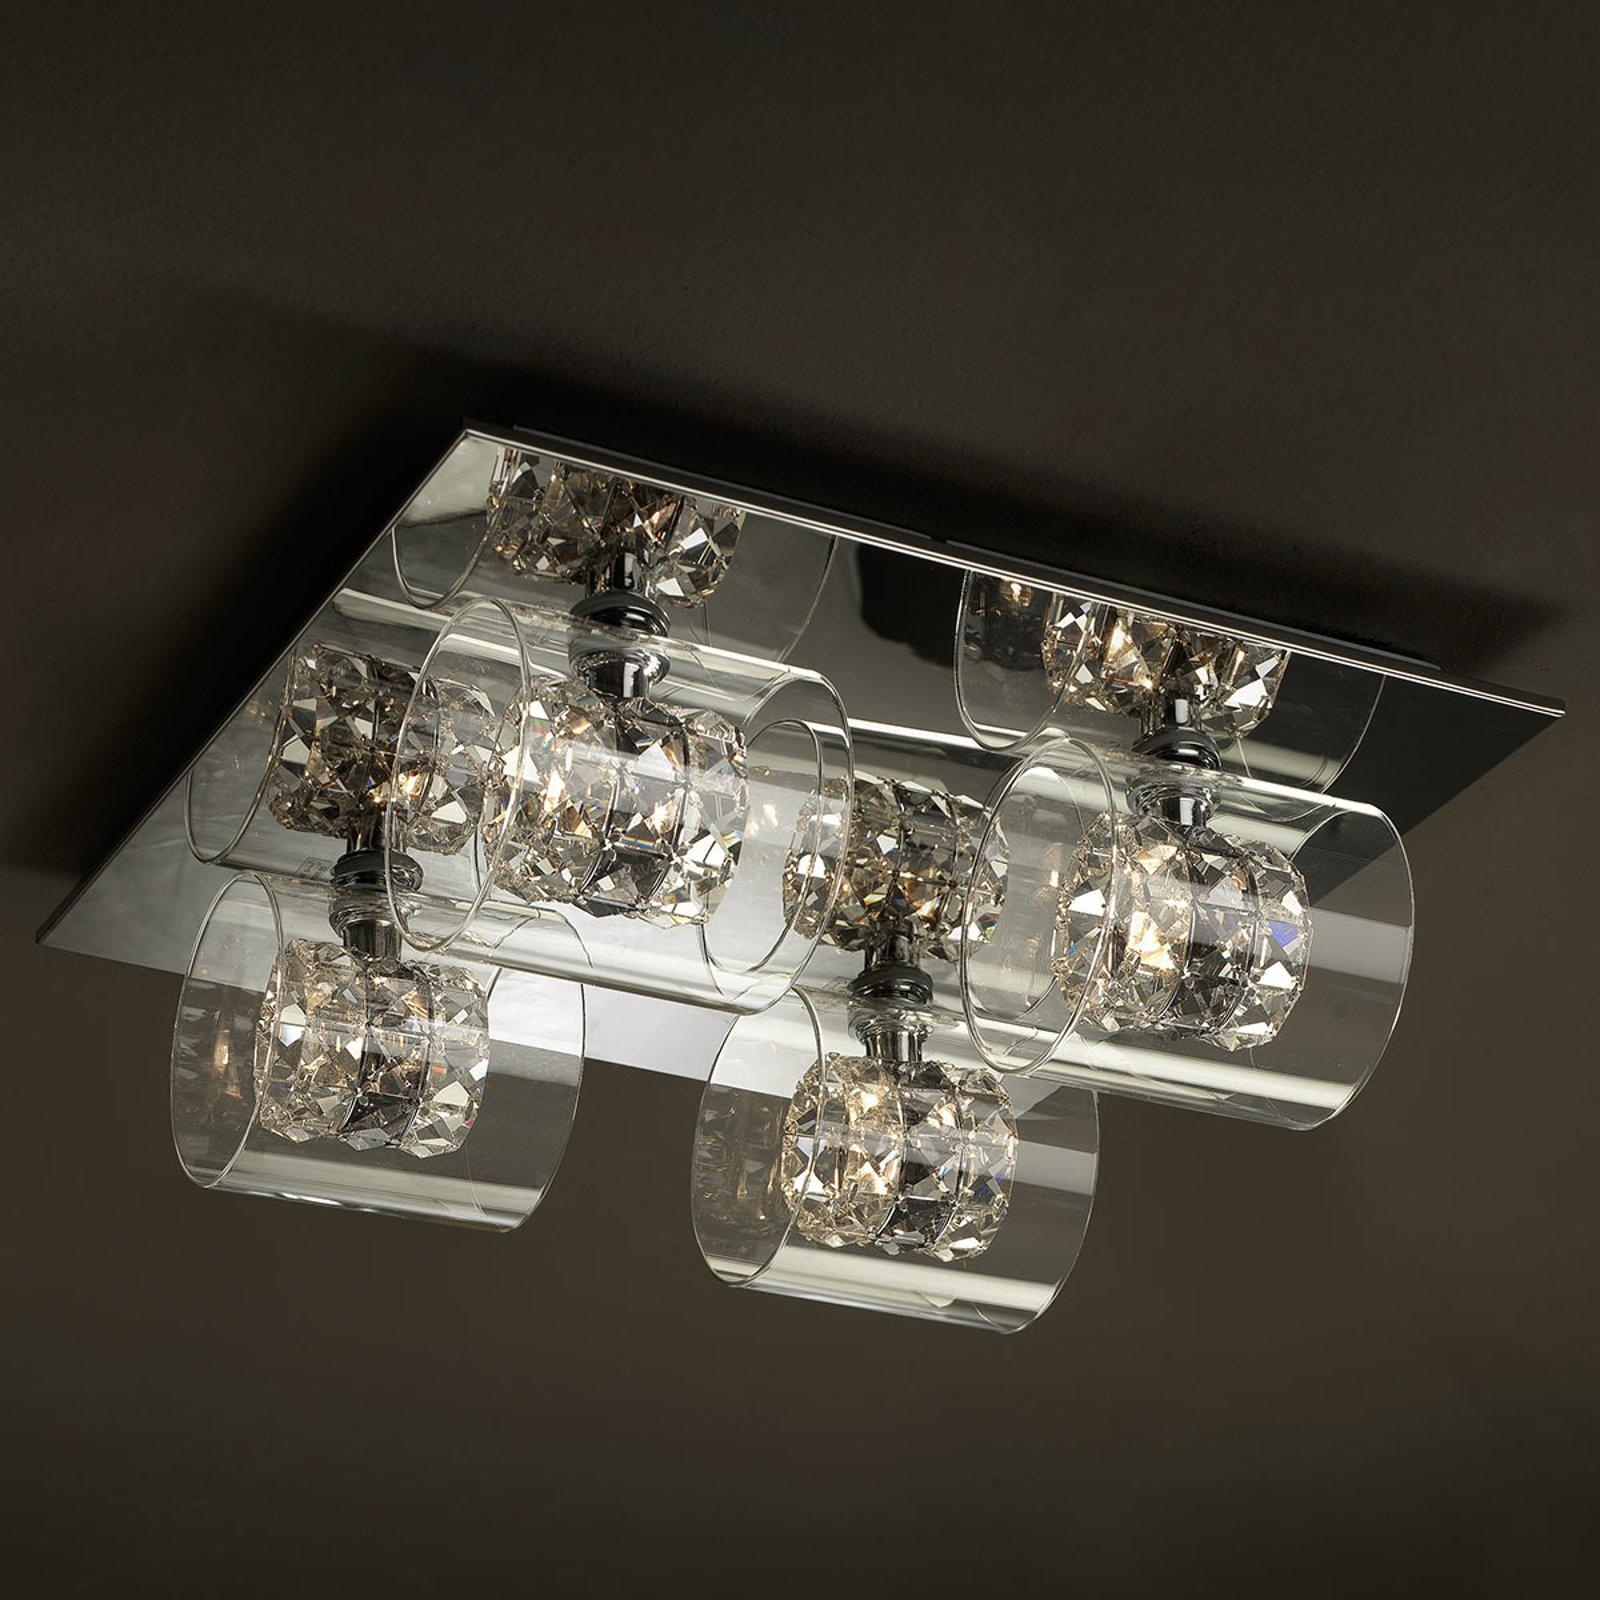 LED-taklampe Flash med krystallringer